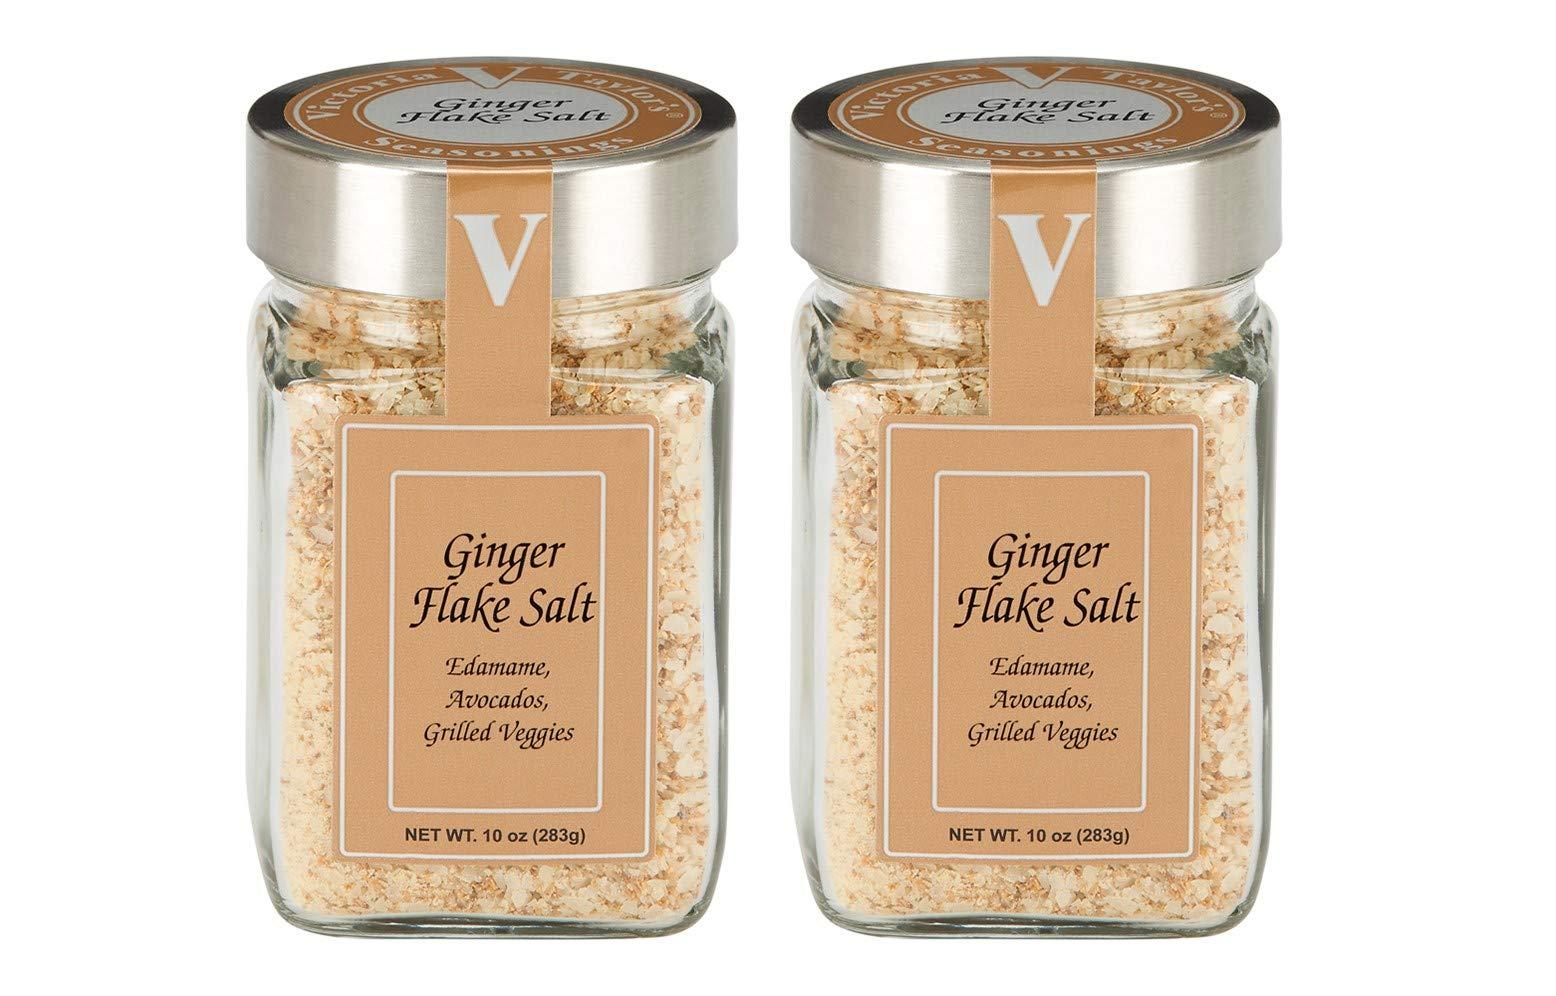 Ginger Flake Salt 2 Pack - Use on chicken, fish, and vegetables.